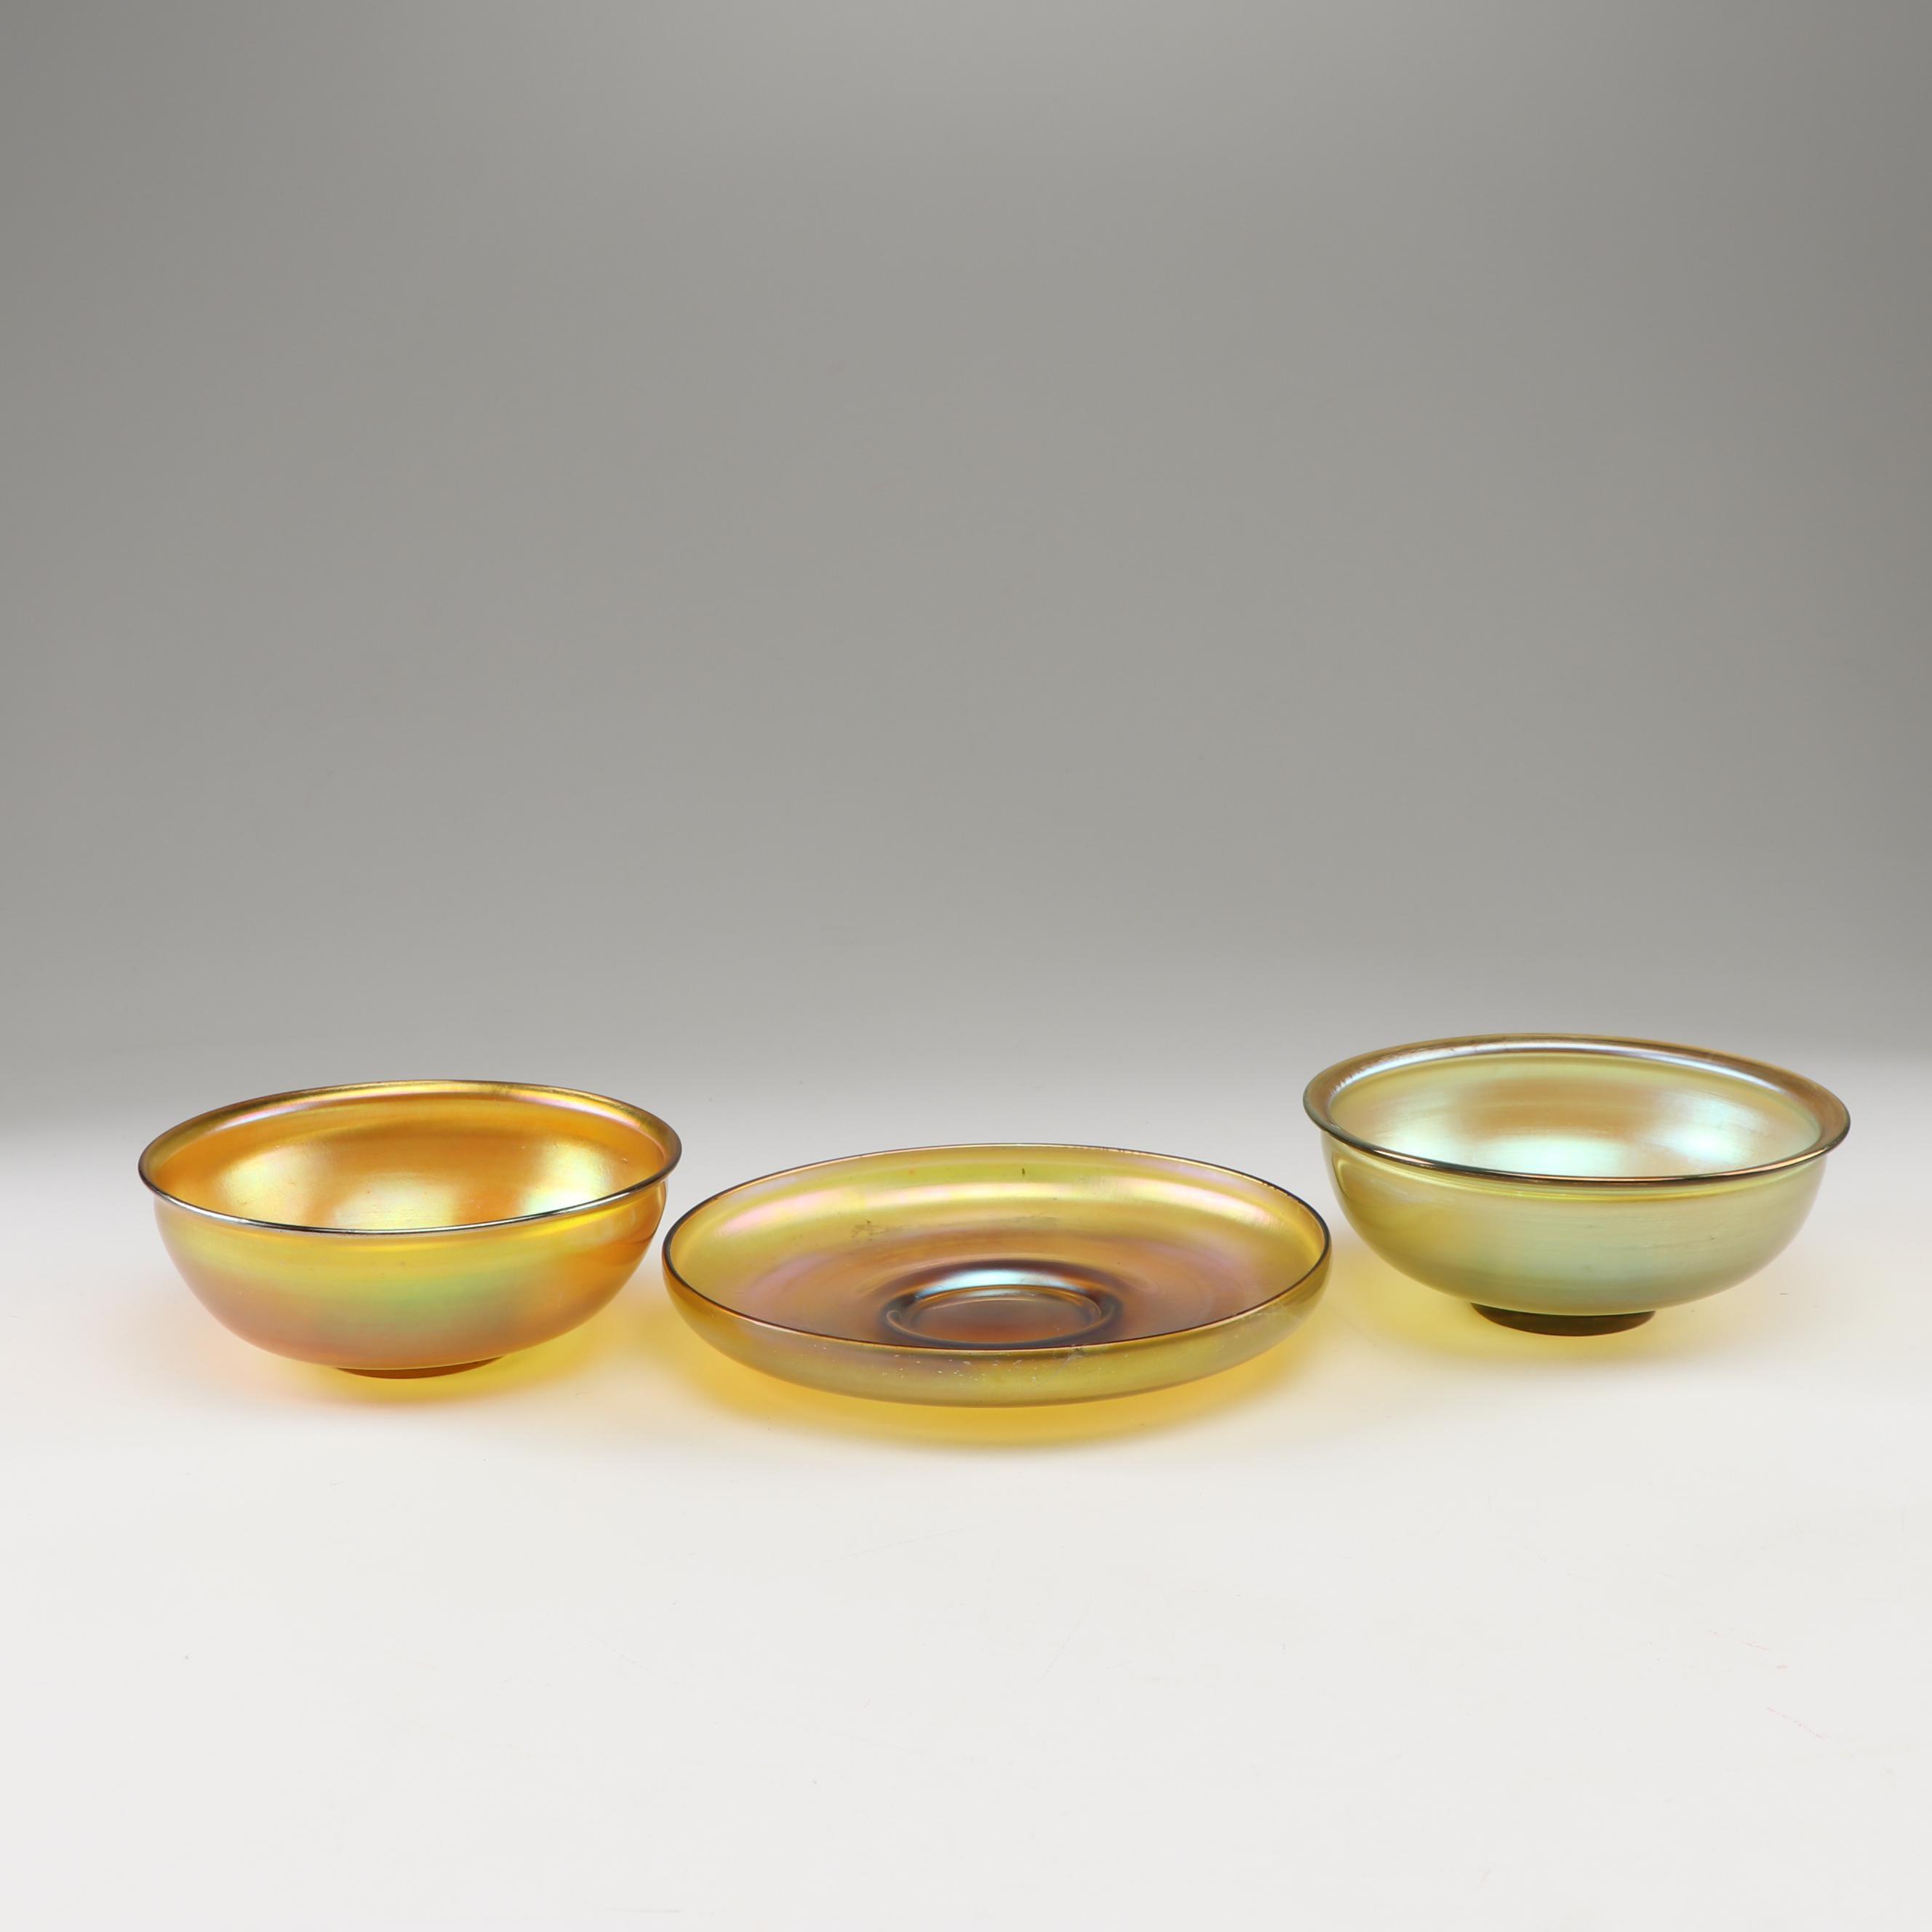 Tiffany Studios Favrile Lustre Glass Bowls and Plate, circa 1900